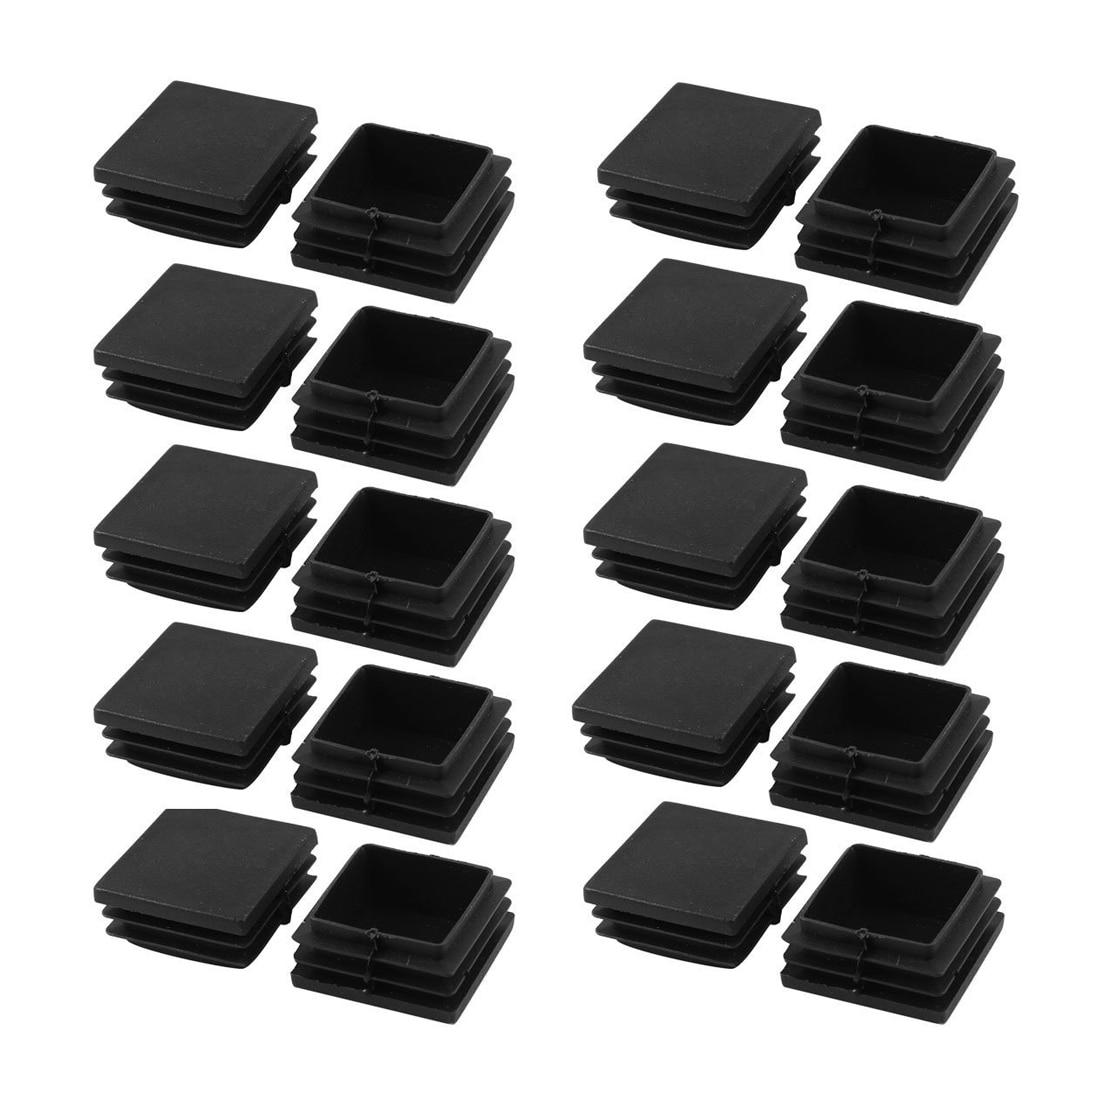 Promotion! 20 pieces Plastic square tube coupling cap plug 40 mm x black